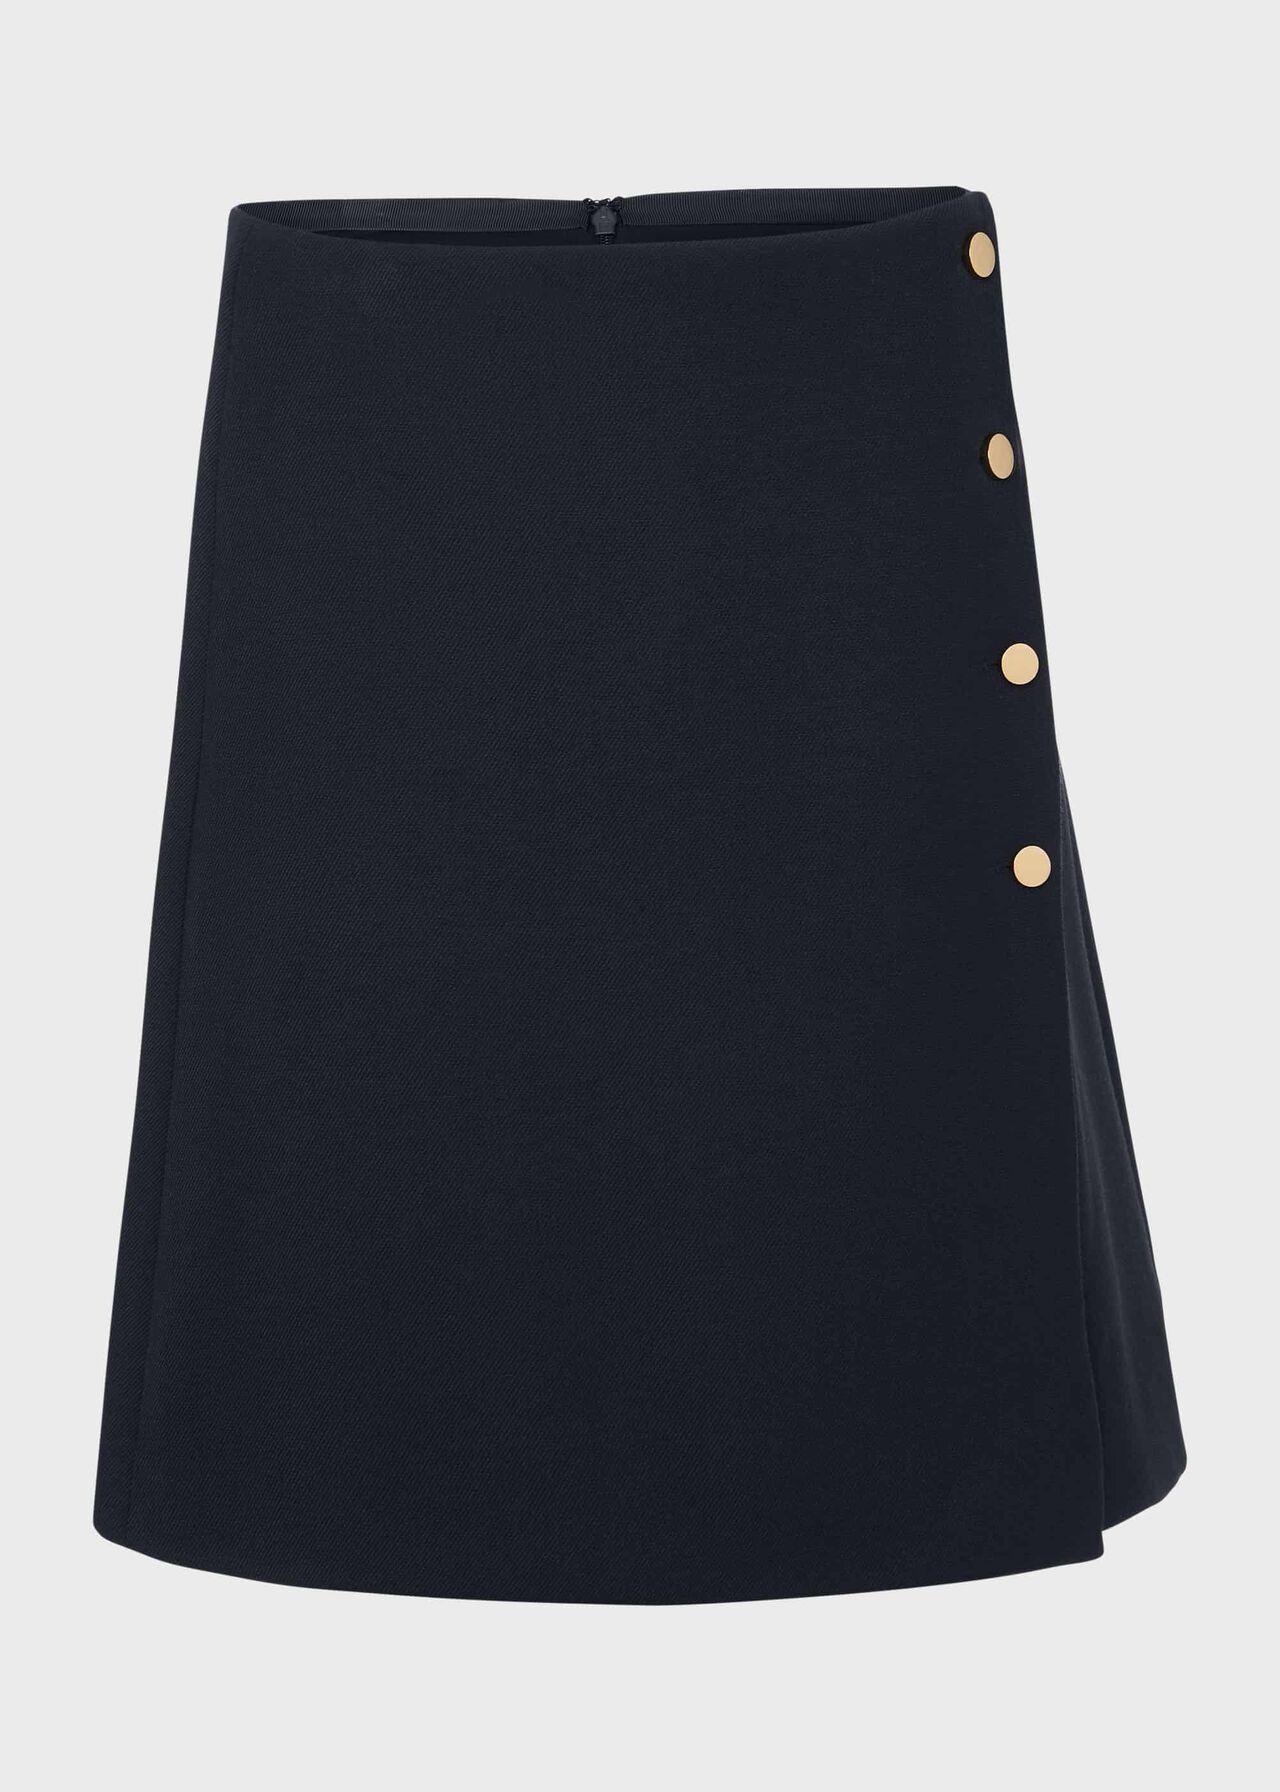 Aurielia A Line Skirt Navy